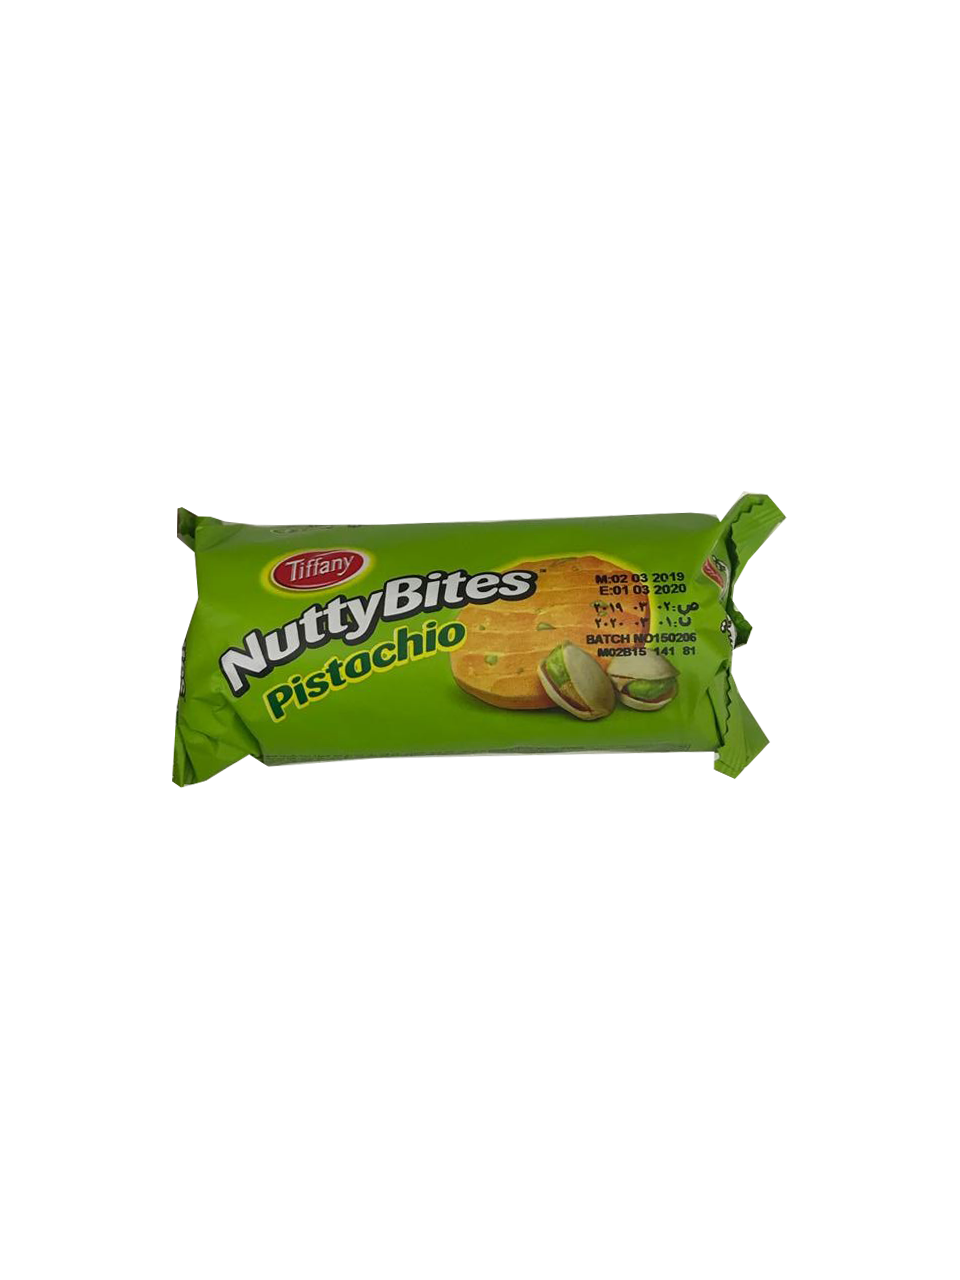 Tiffany Nutty Bites Pistachio 90g